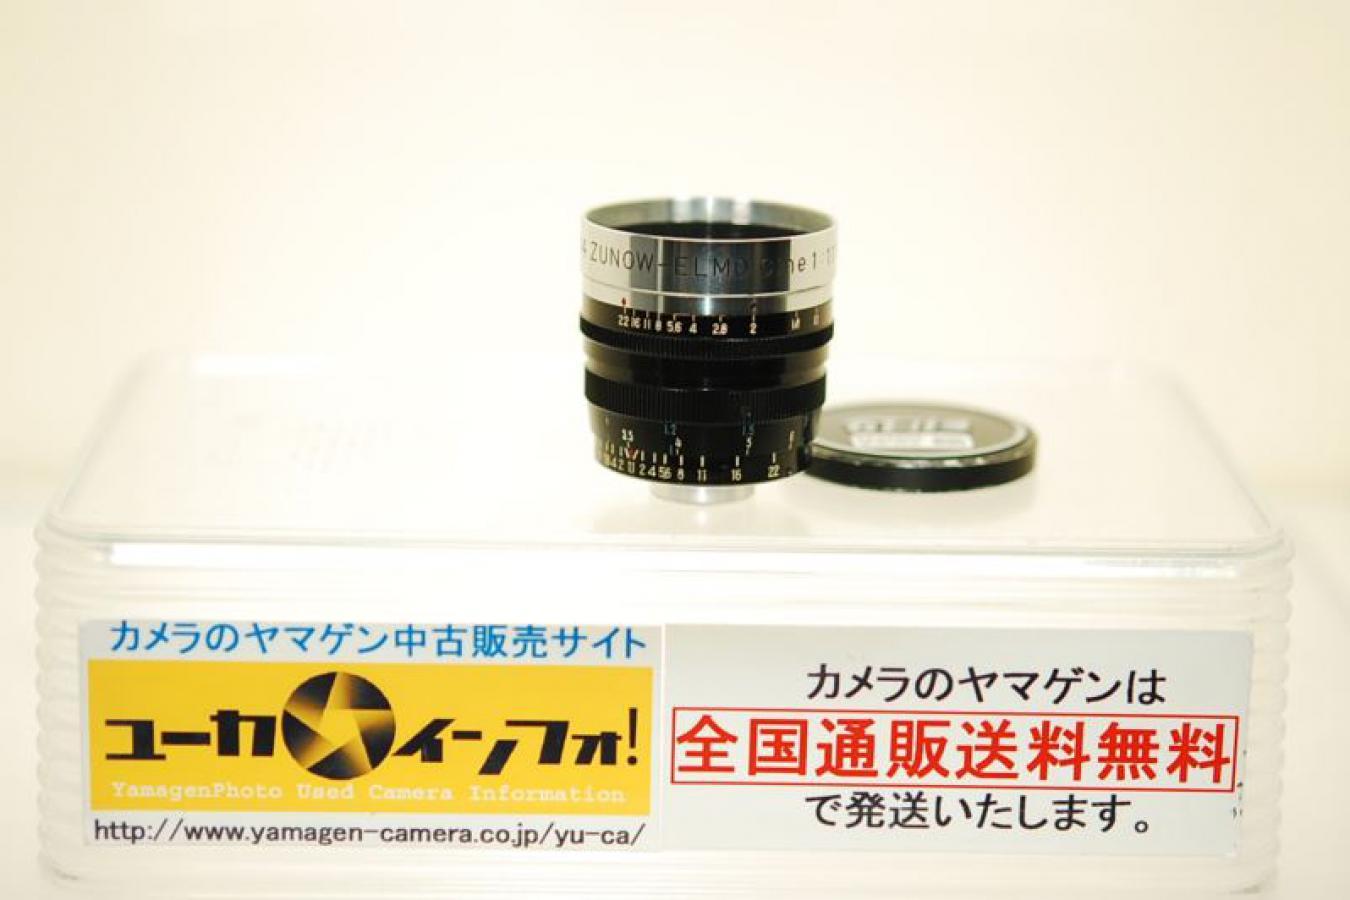 Zunow-ELMO Cine 38mm F1.1 【Dマウントレンズ】